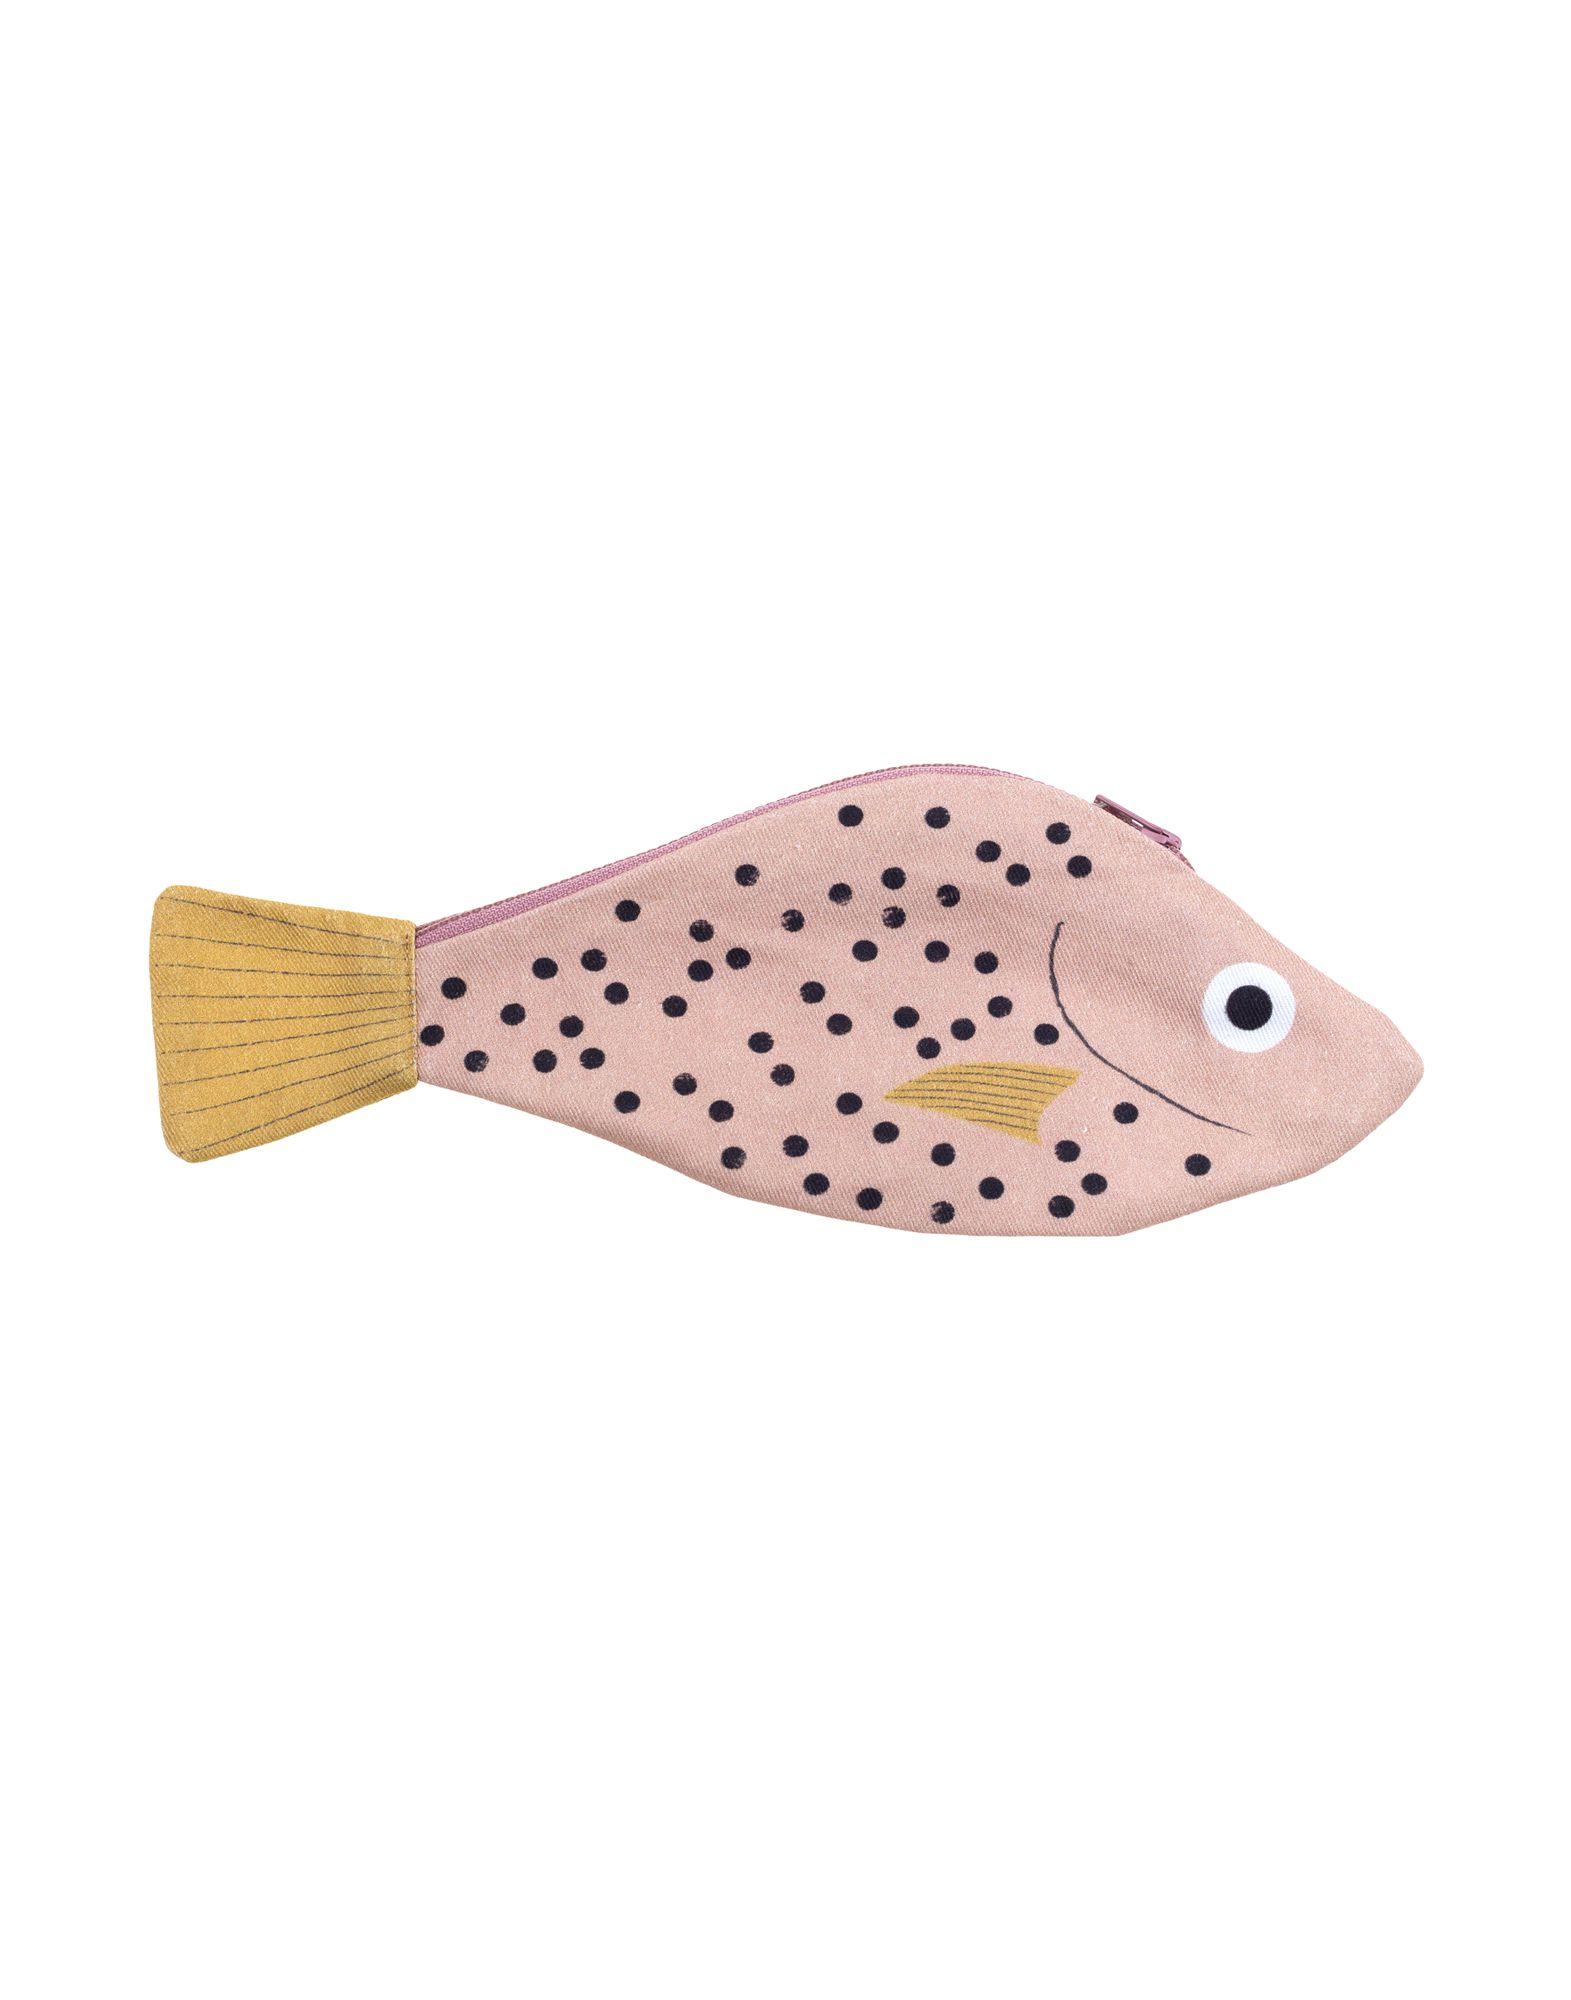 DON FISHER Пенал don fisher пенал